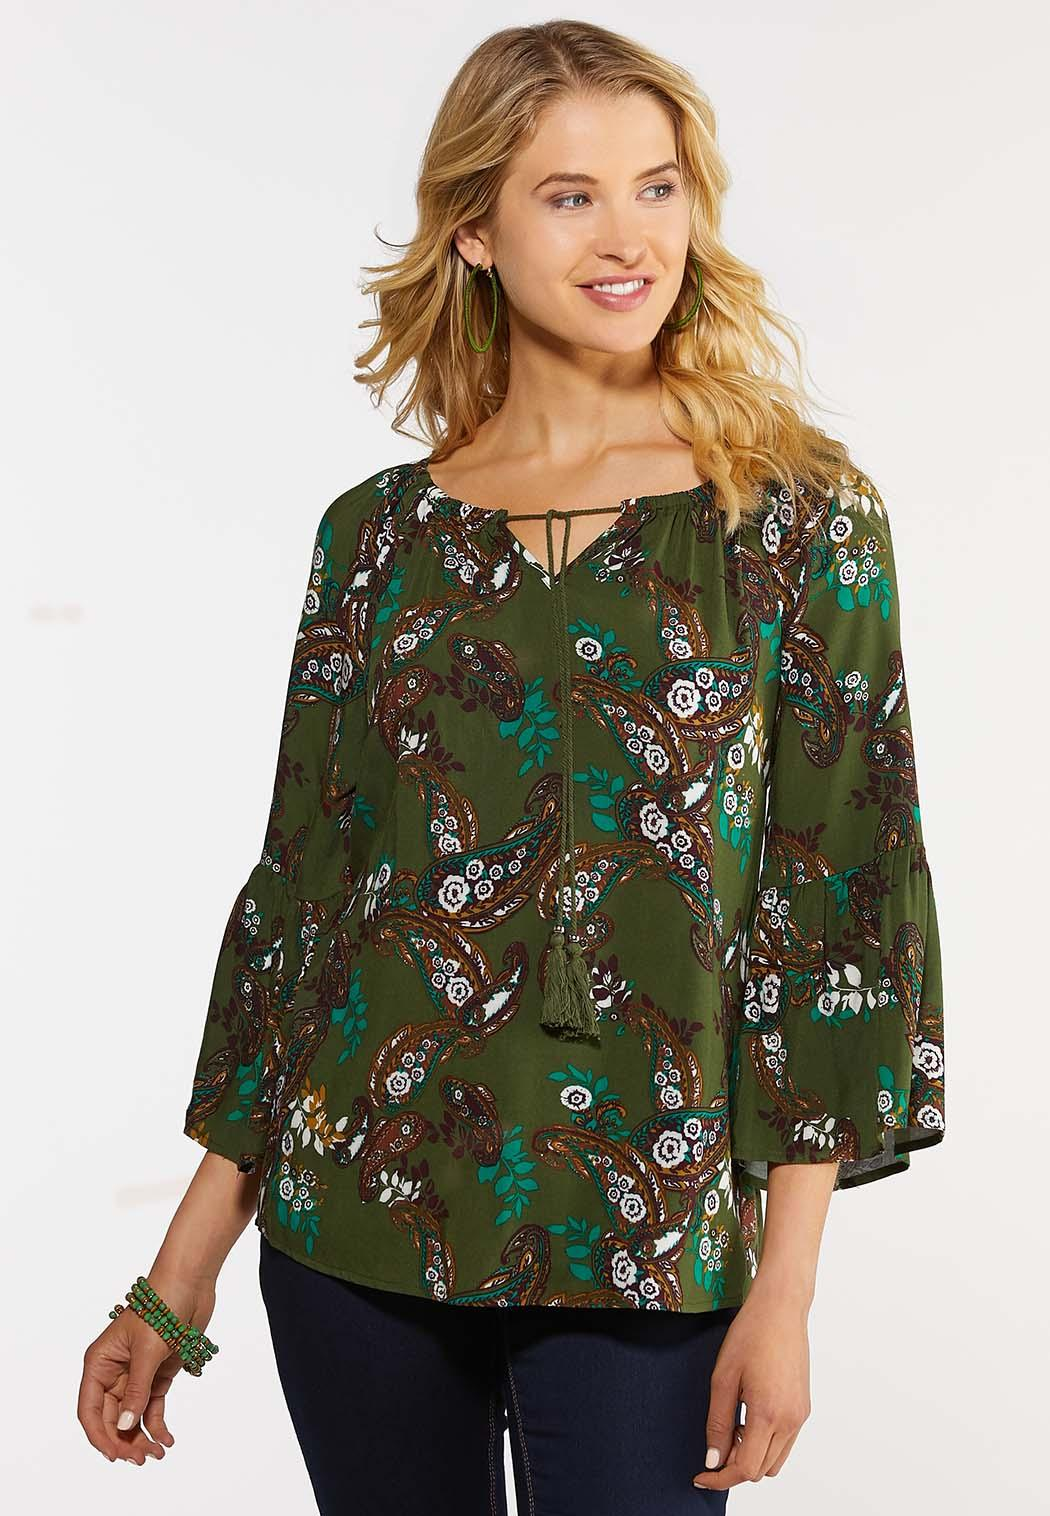 Plus Size Olive Floral Paisley Top